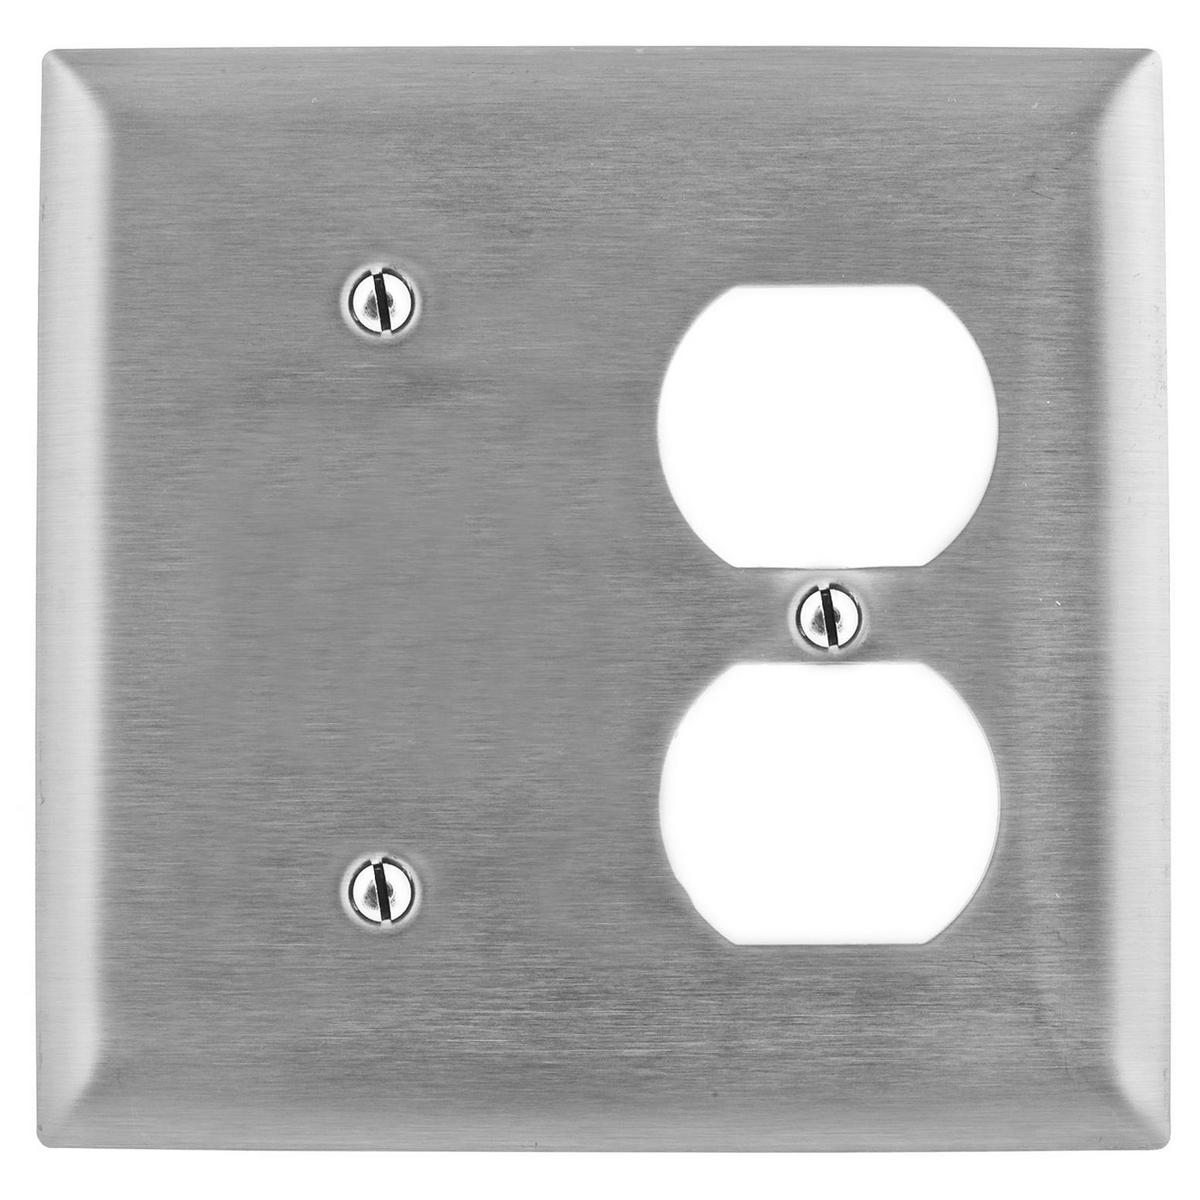 Hubbell SS138 WALLPLATE, 2-G, BLANK/DUP, SS, BOX